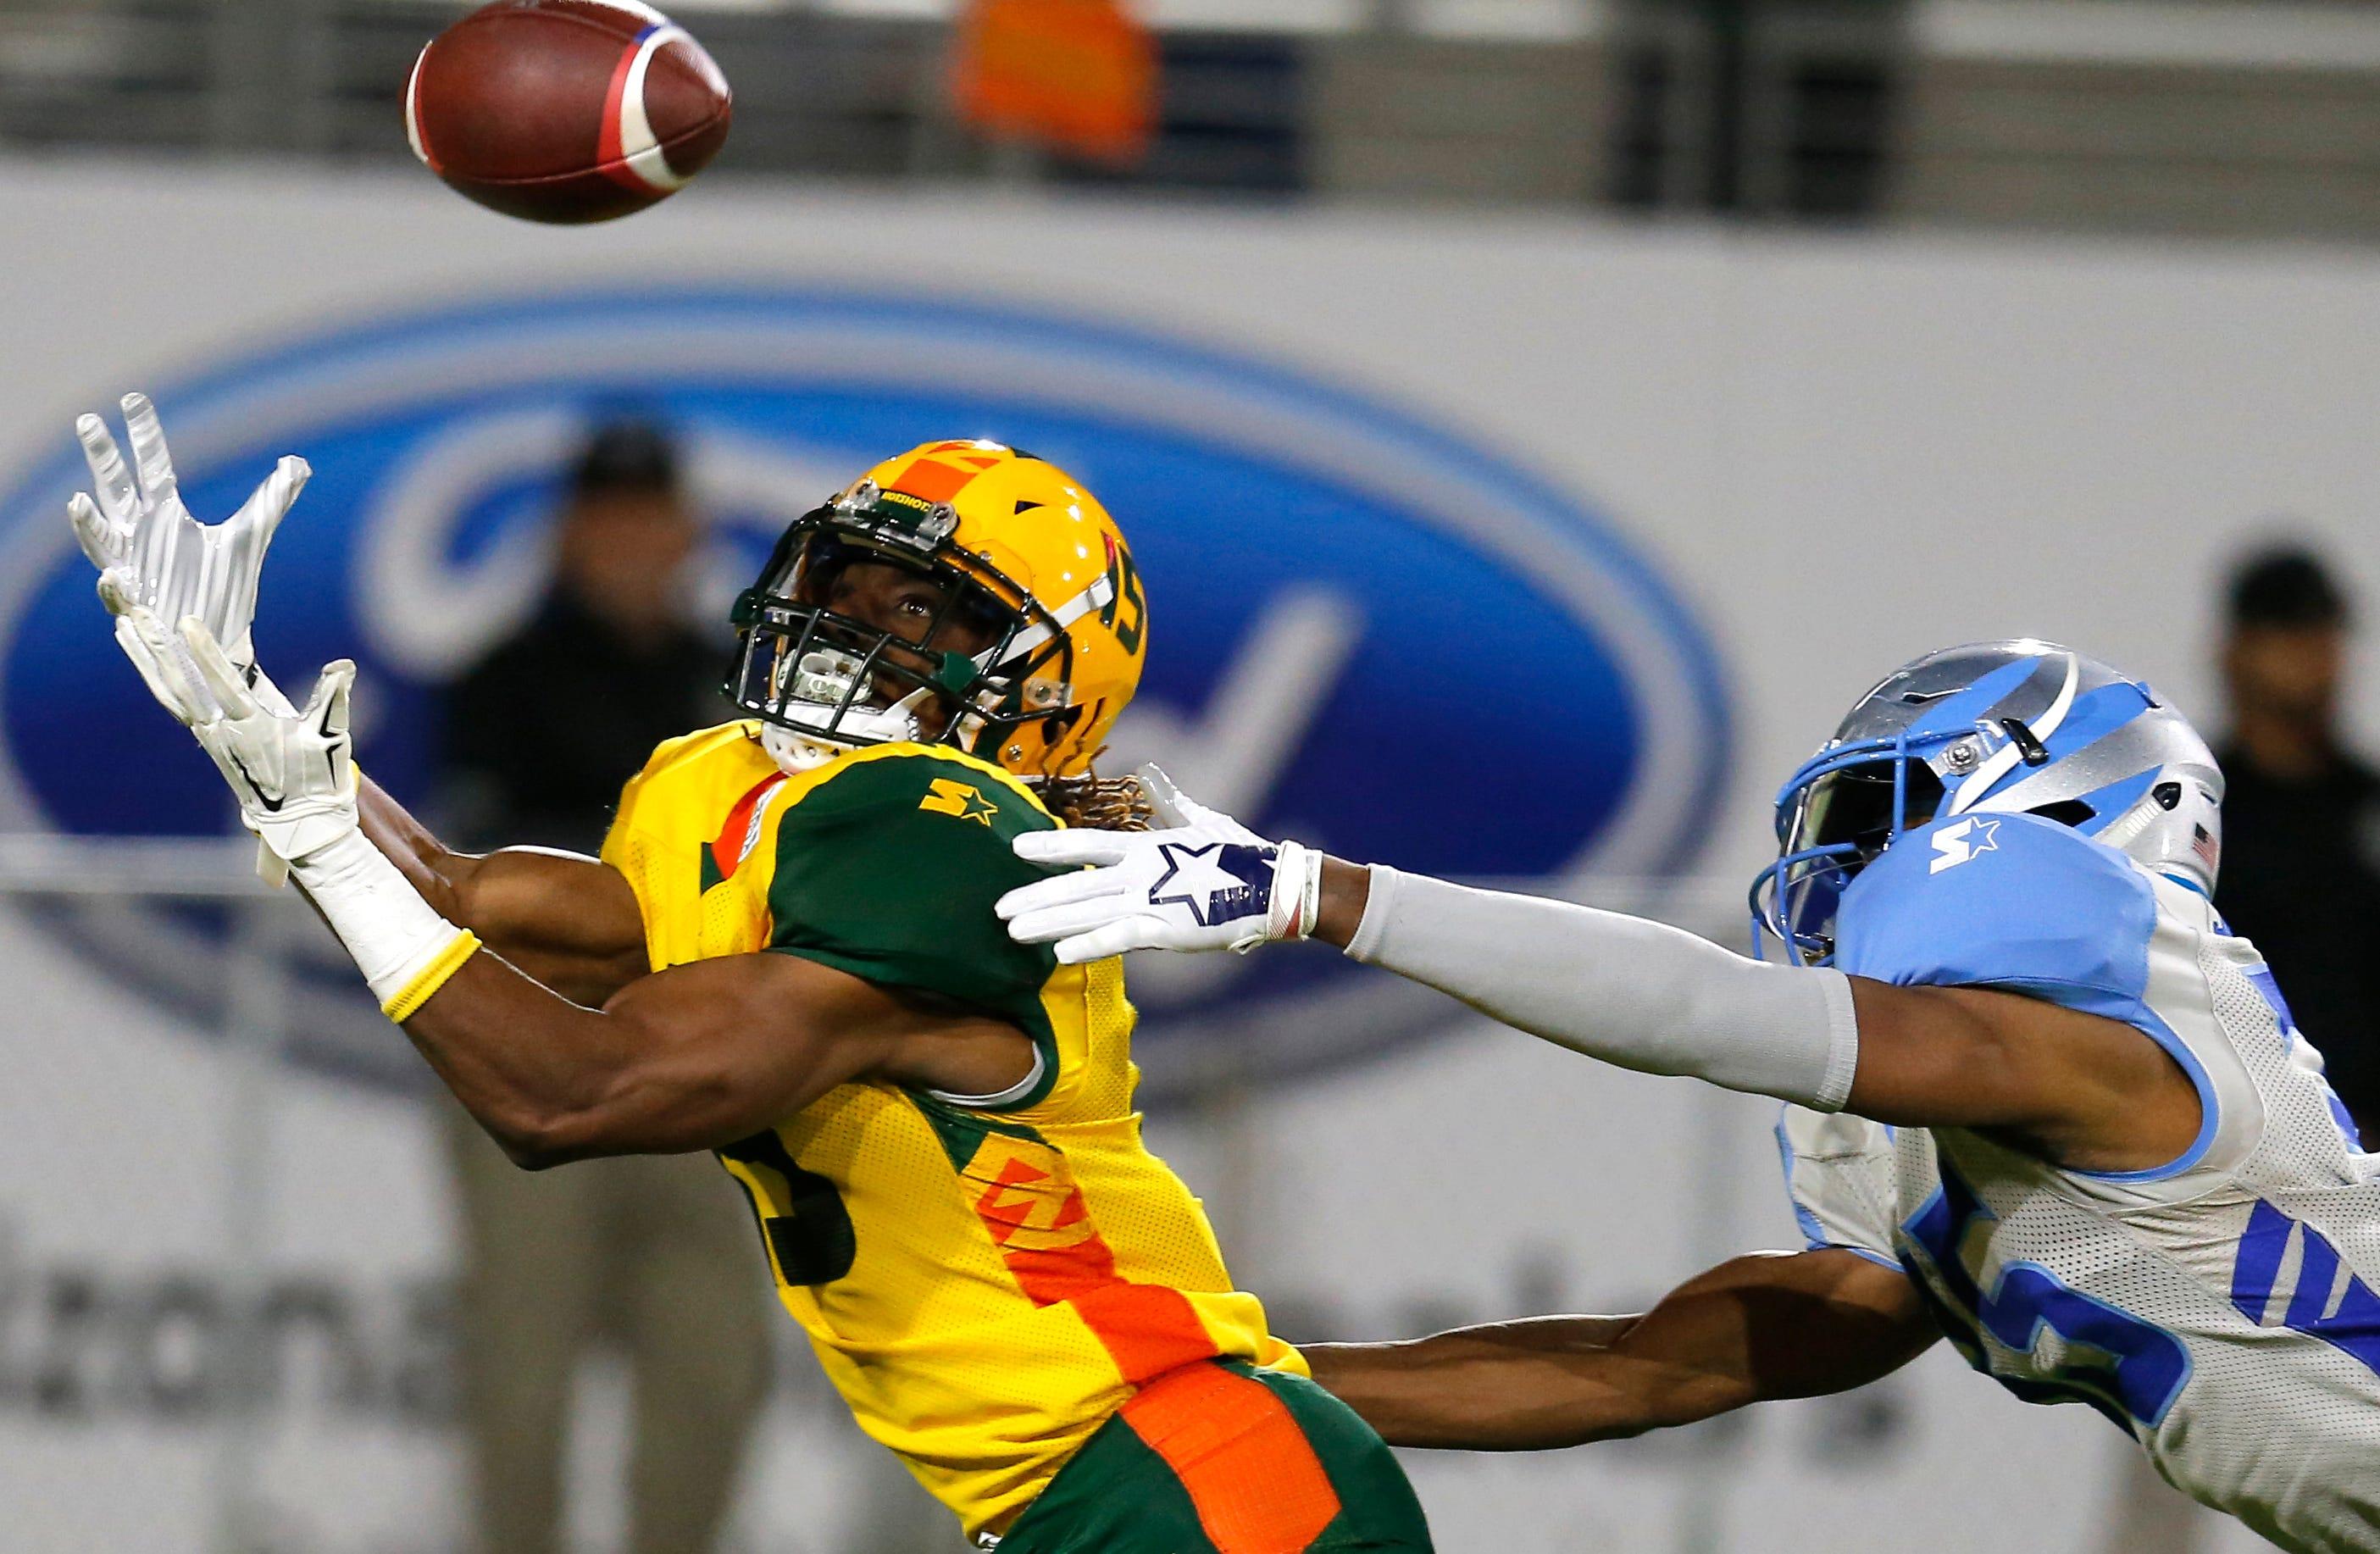 Arizona Hotshots WR Rashad Ross catches a touchdown pass against the Salt Lake Stallions.